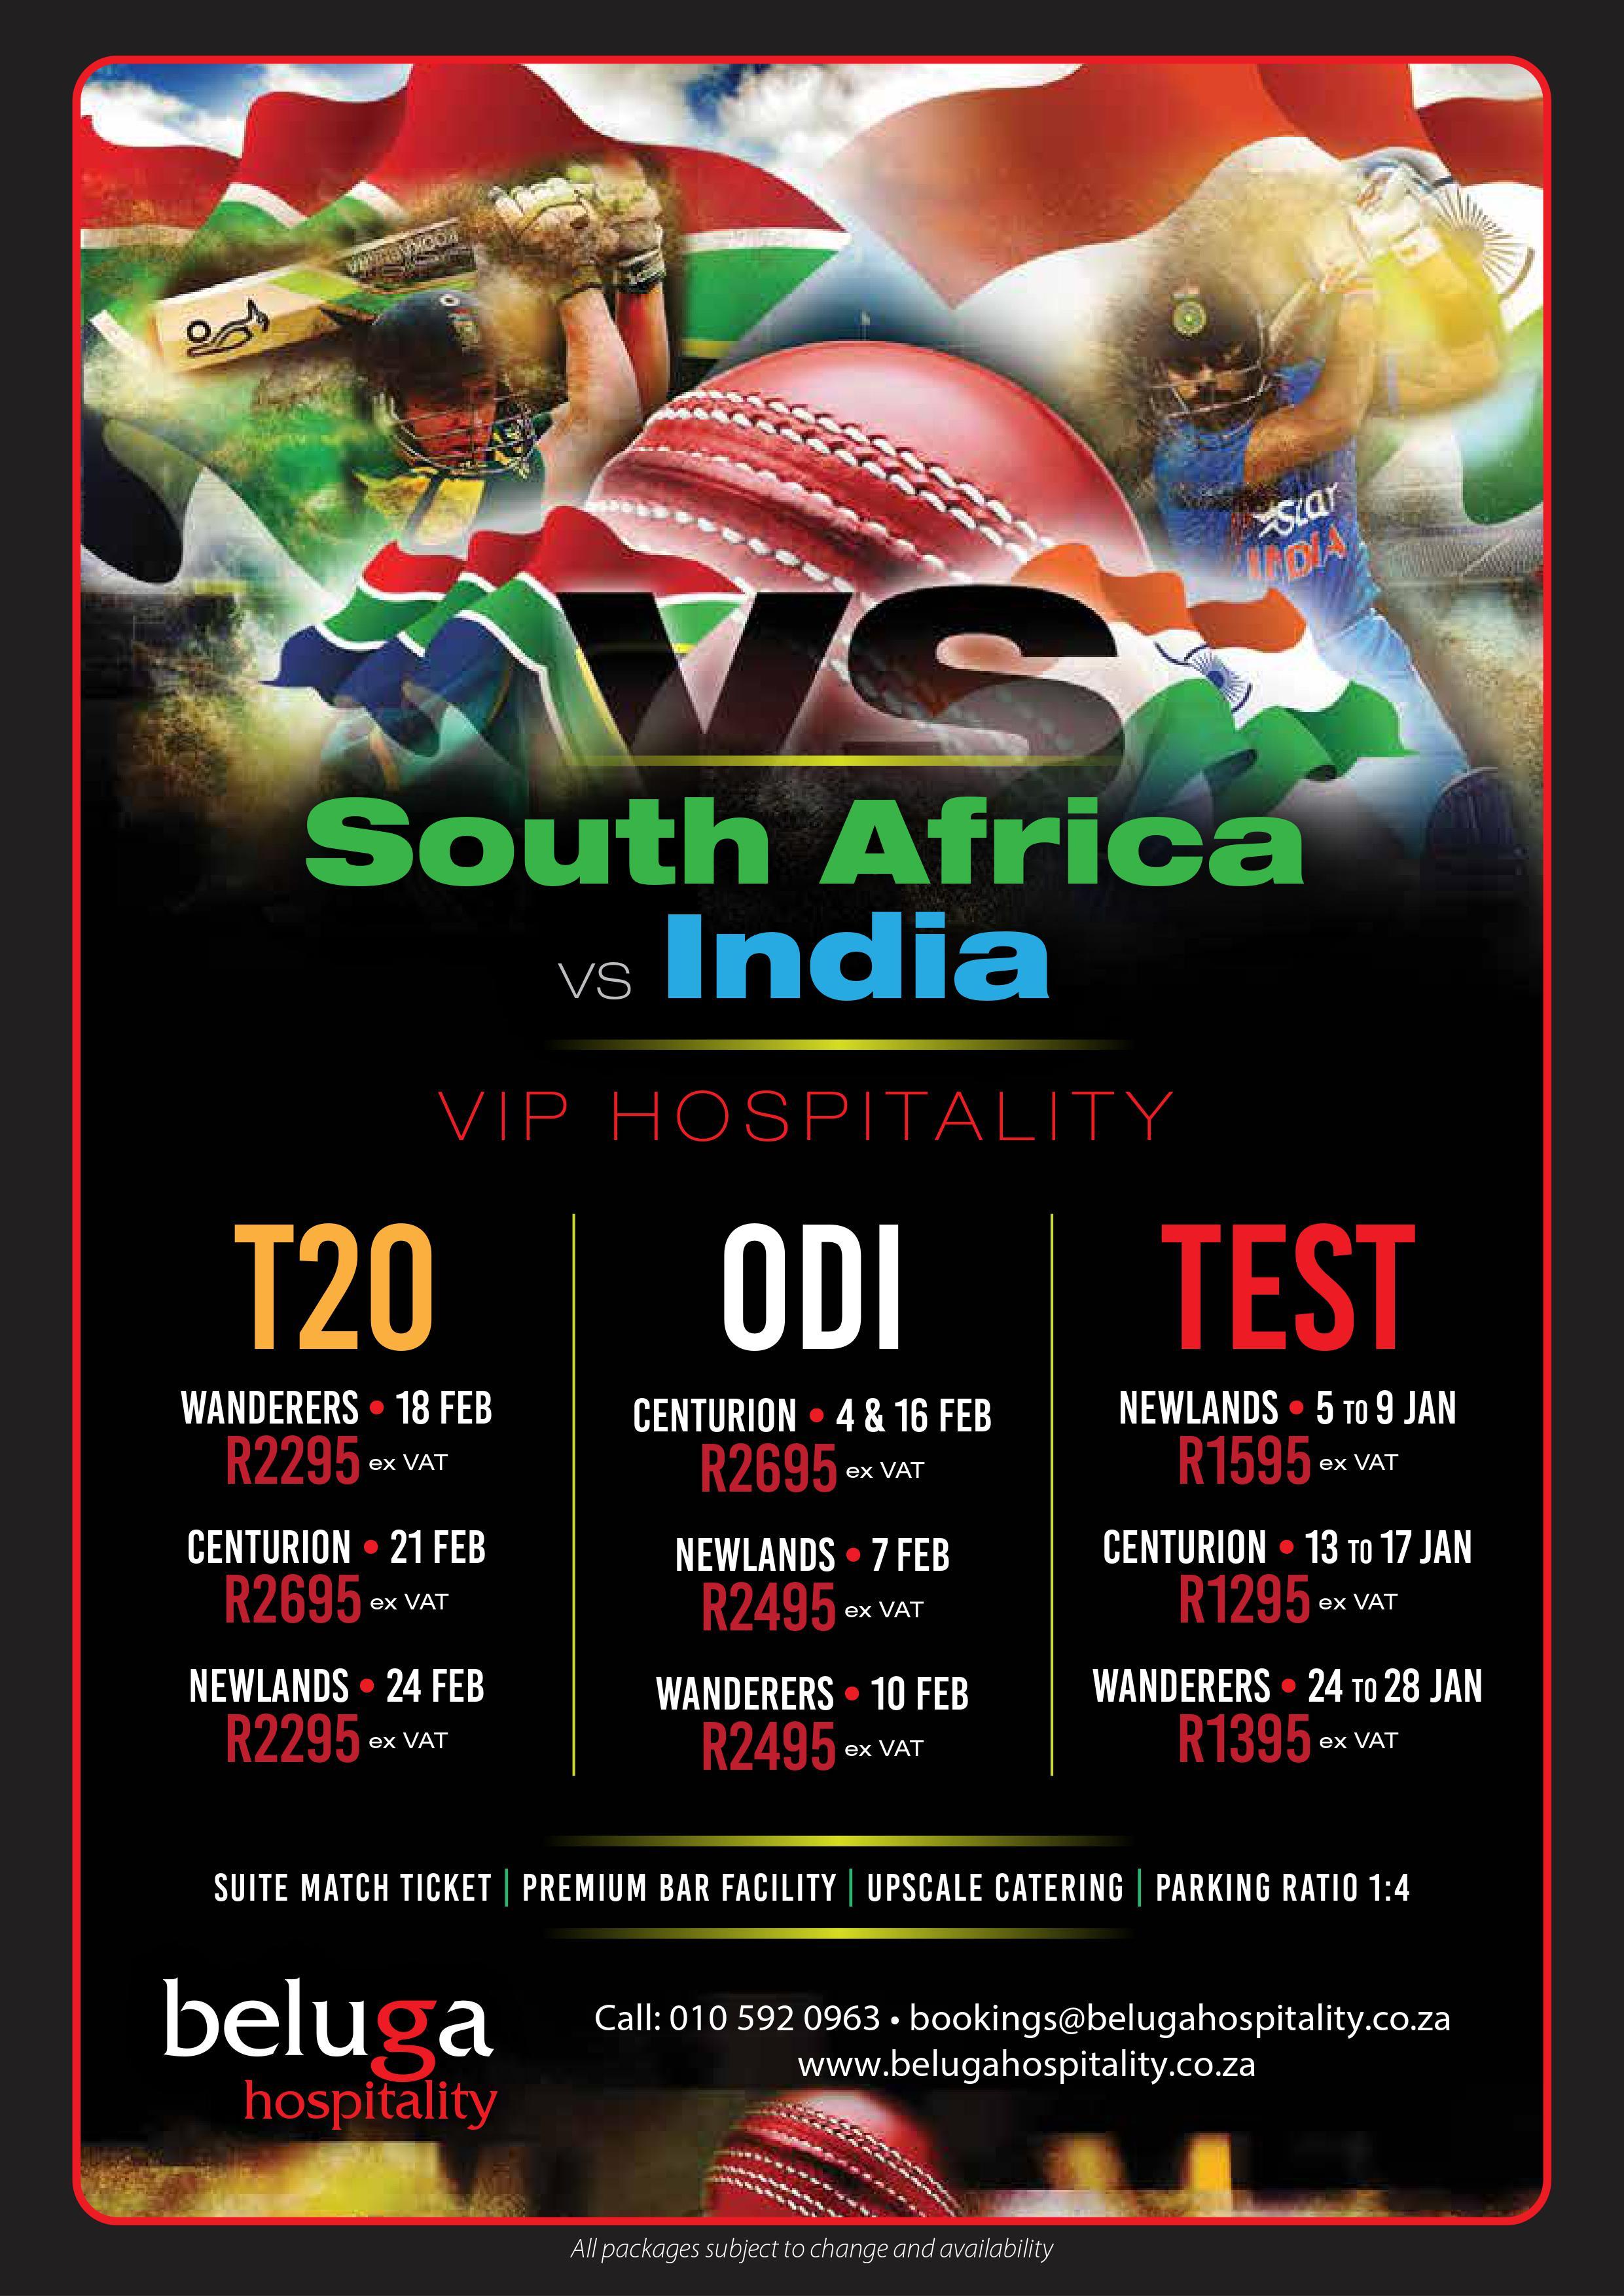 South Africa vs India Cricket – Test Series 2018 - Beluga